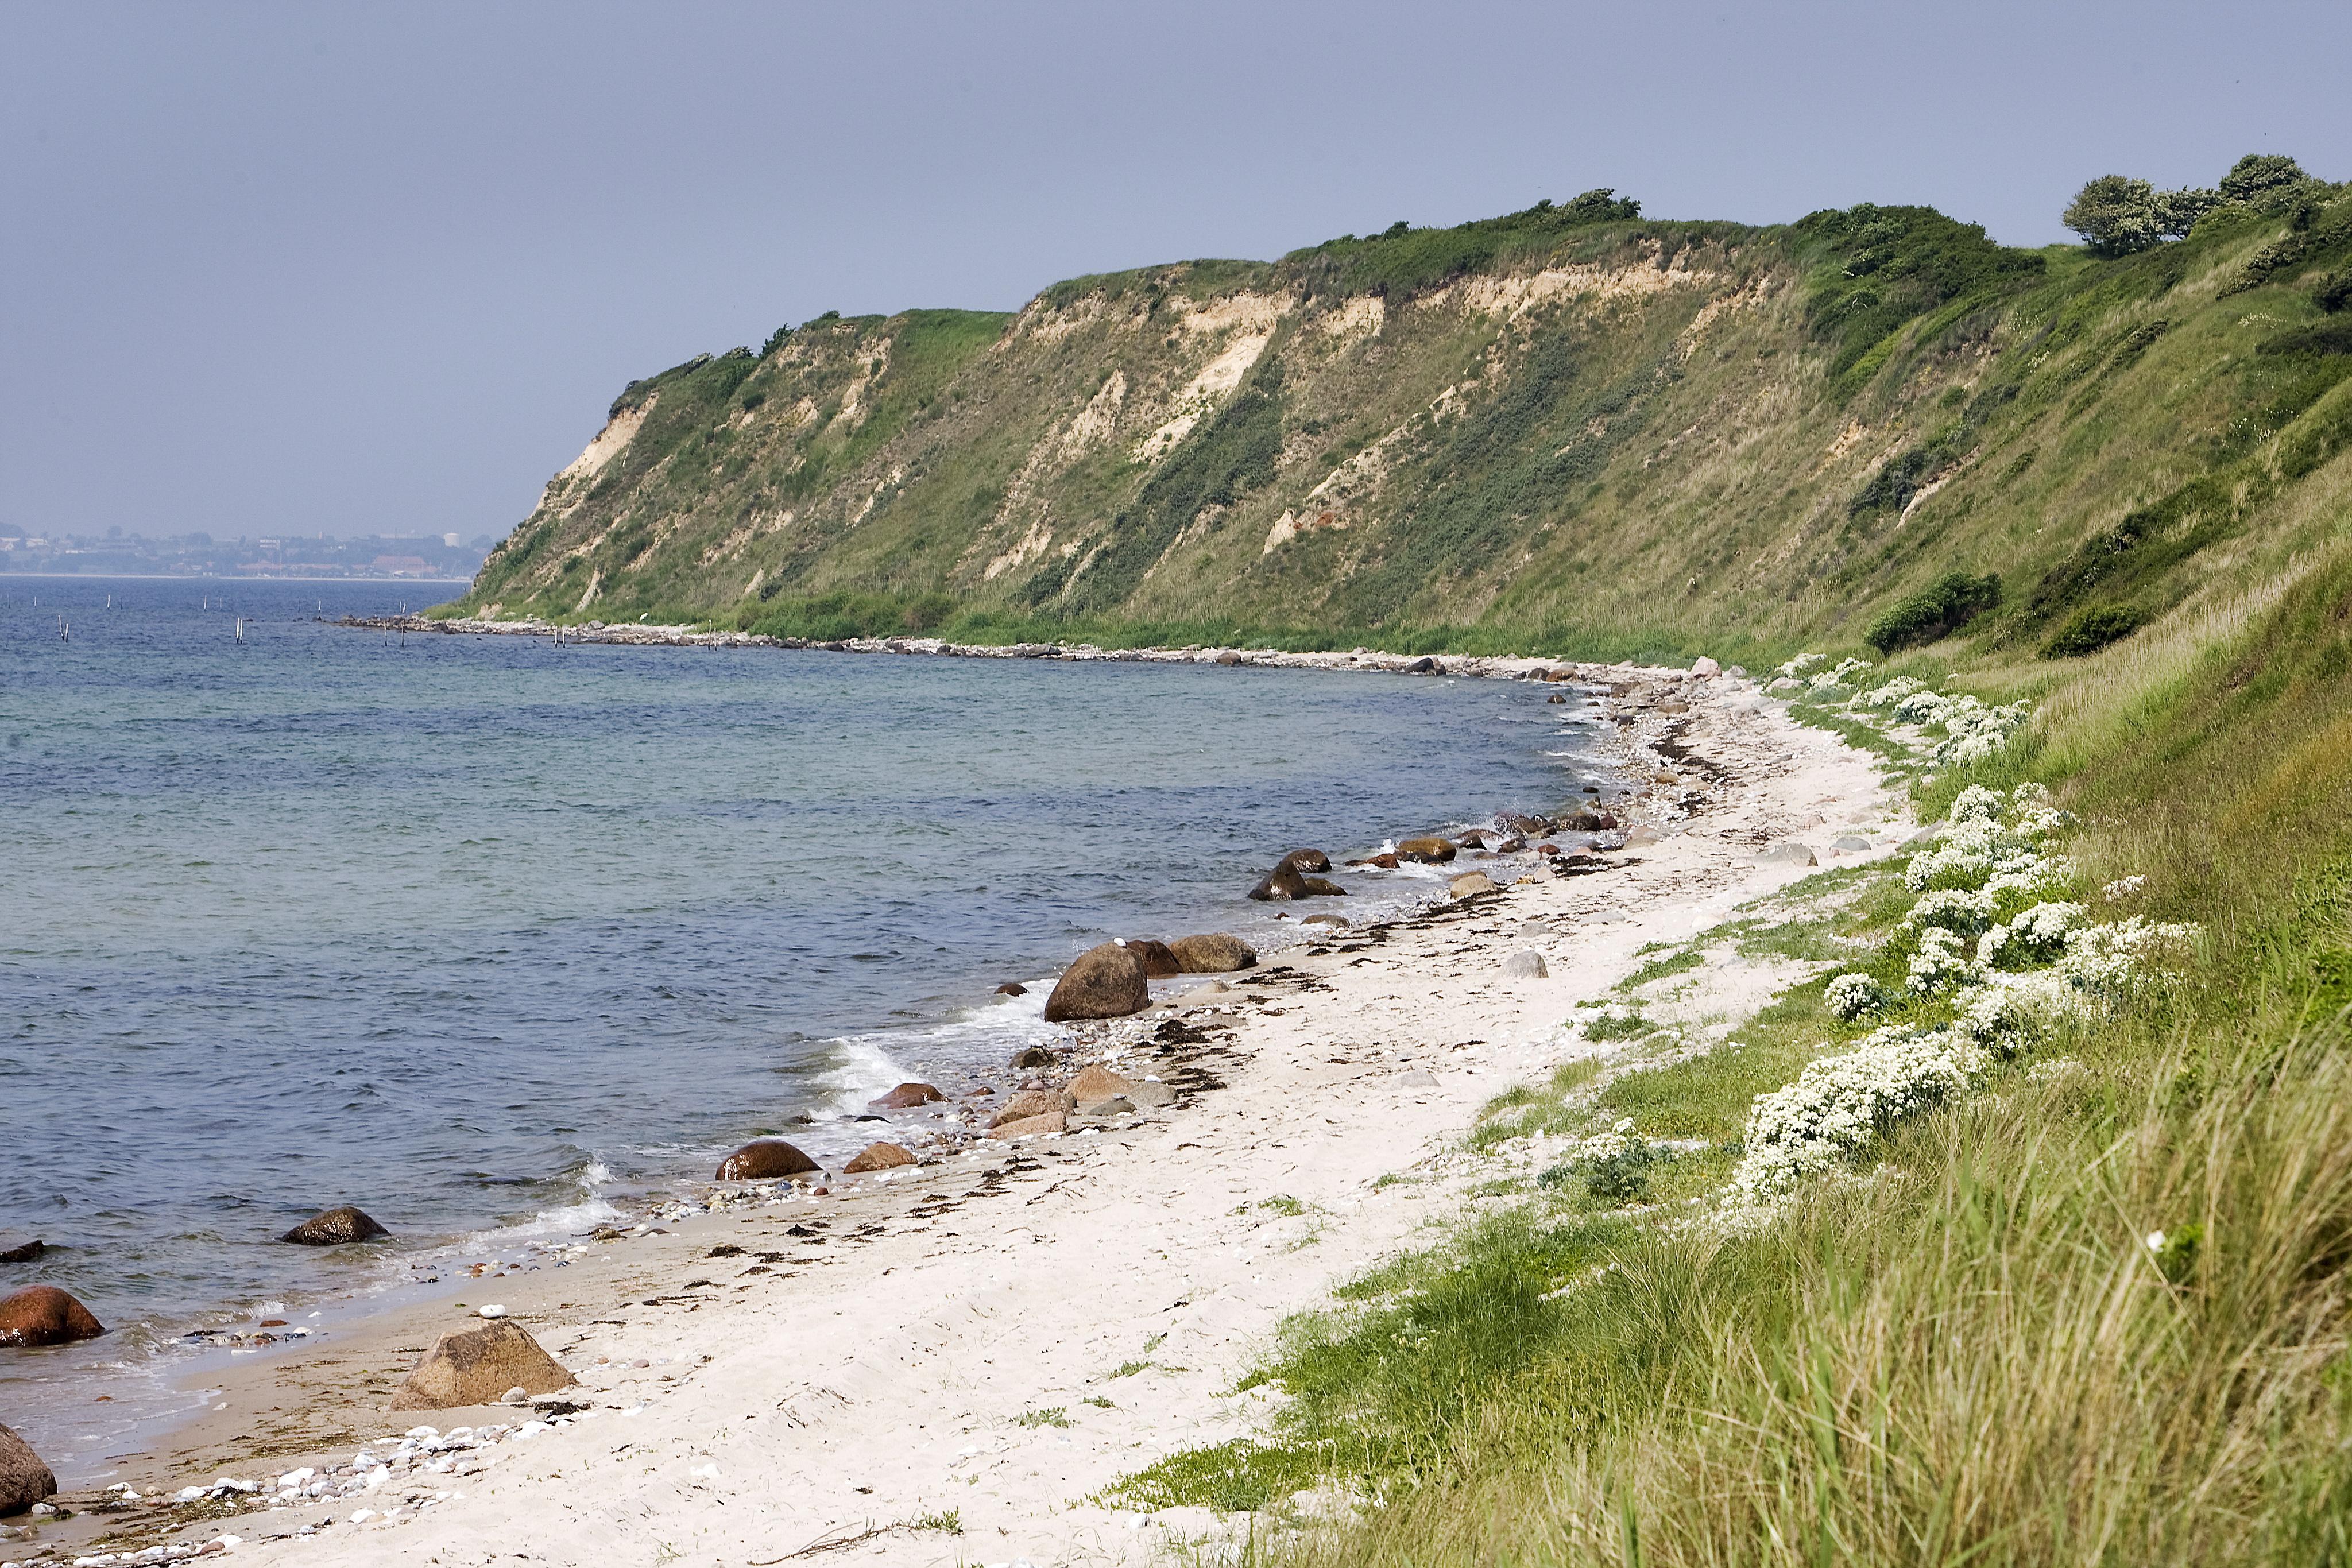 Humble Kro & Hotel on Langeland near Denmark's best beach